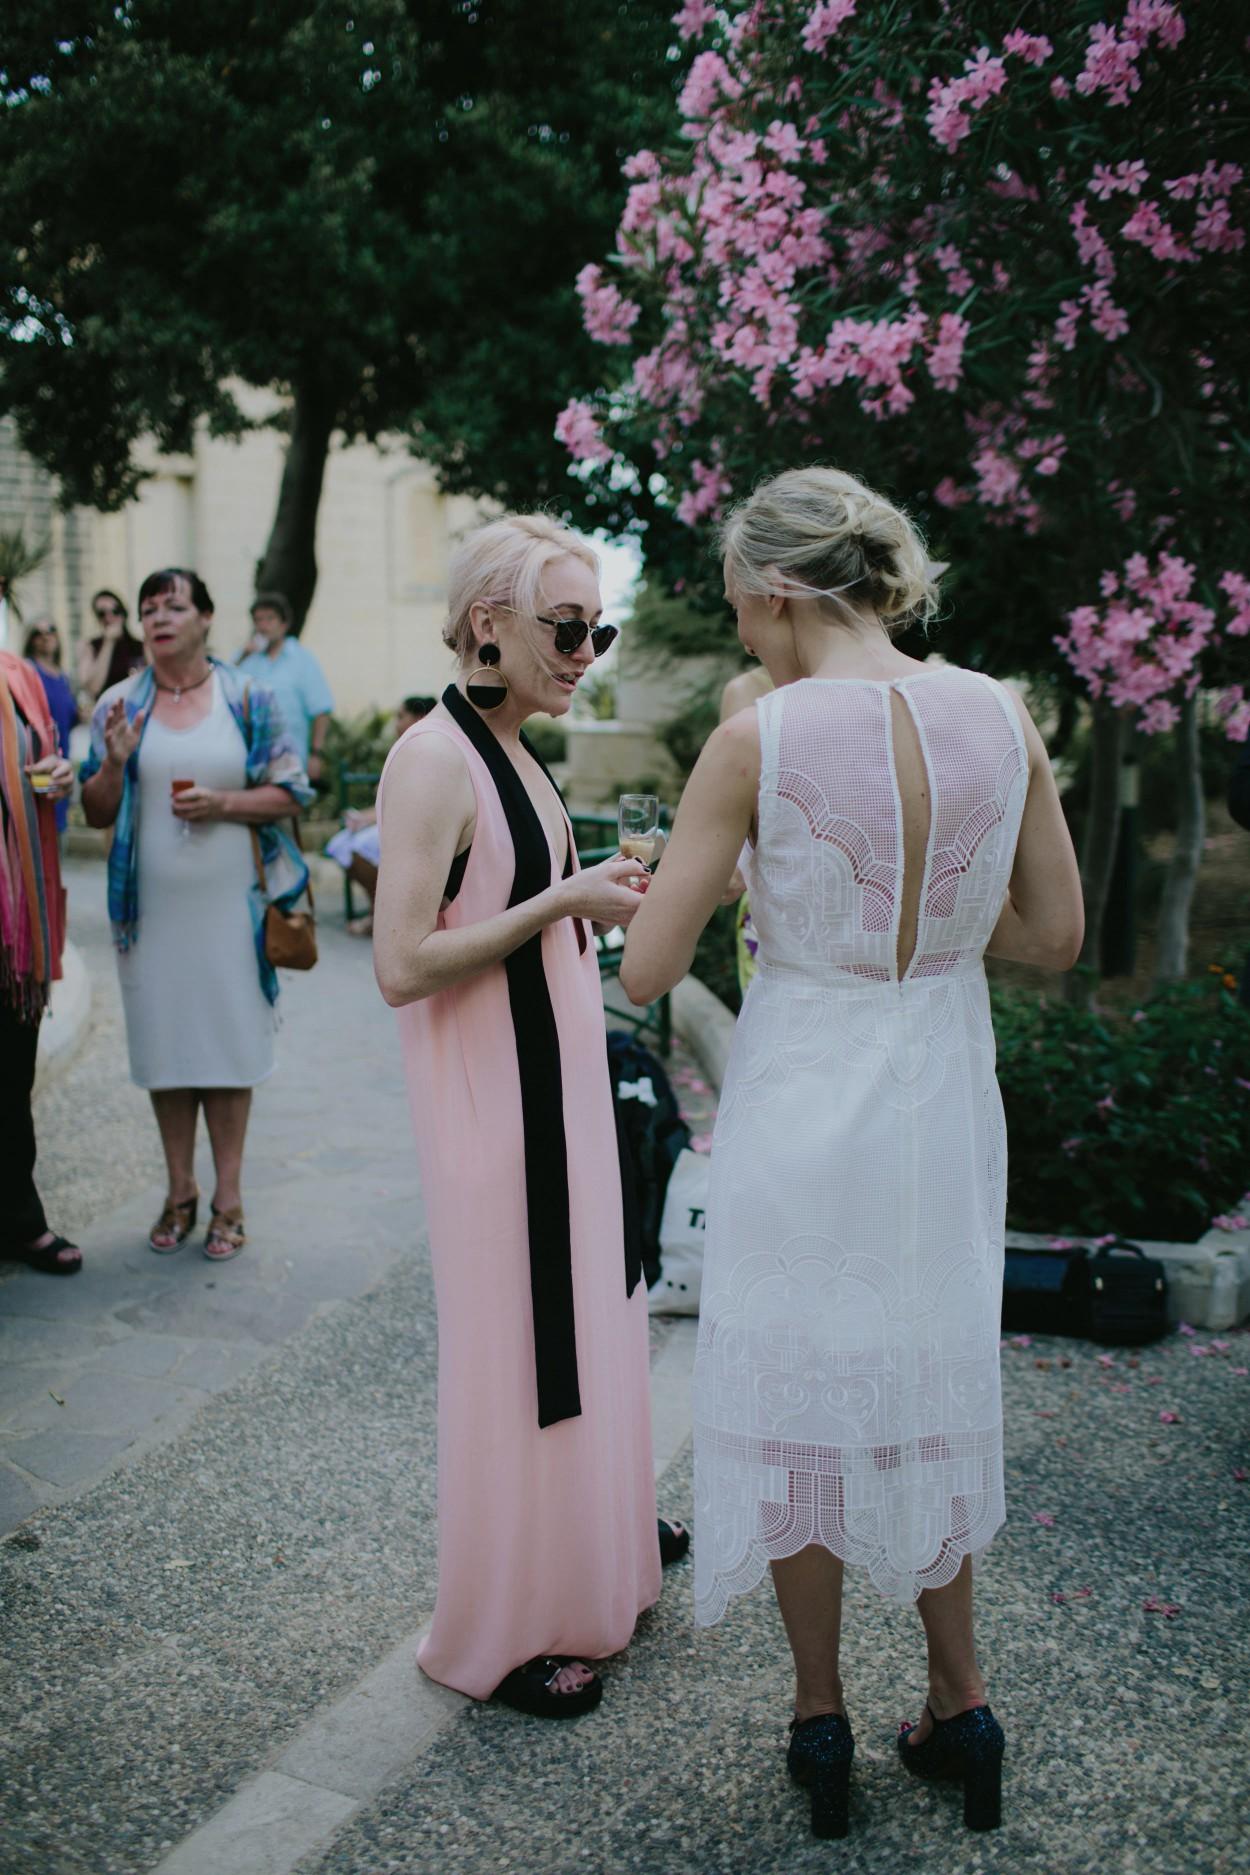 I-Got-You-Babe-Weddings-Malta-Destination-Elopement-Petra-Brent128.jpg